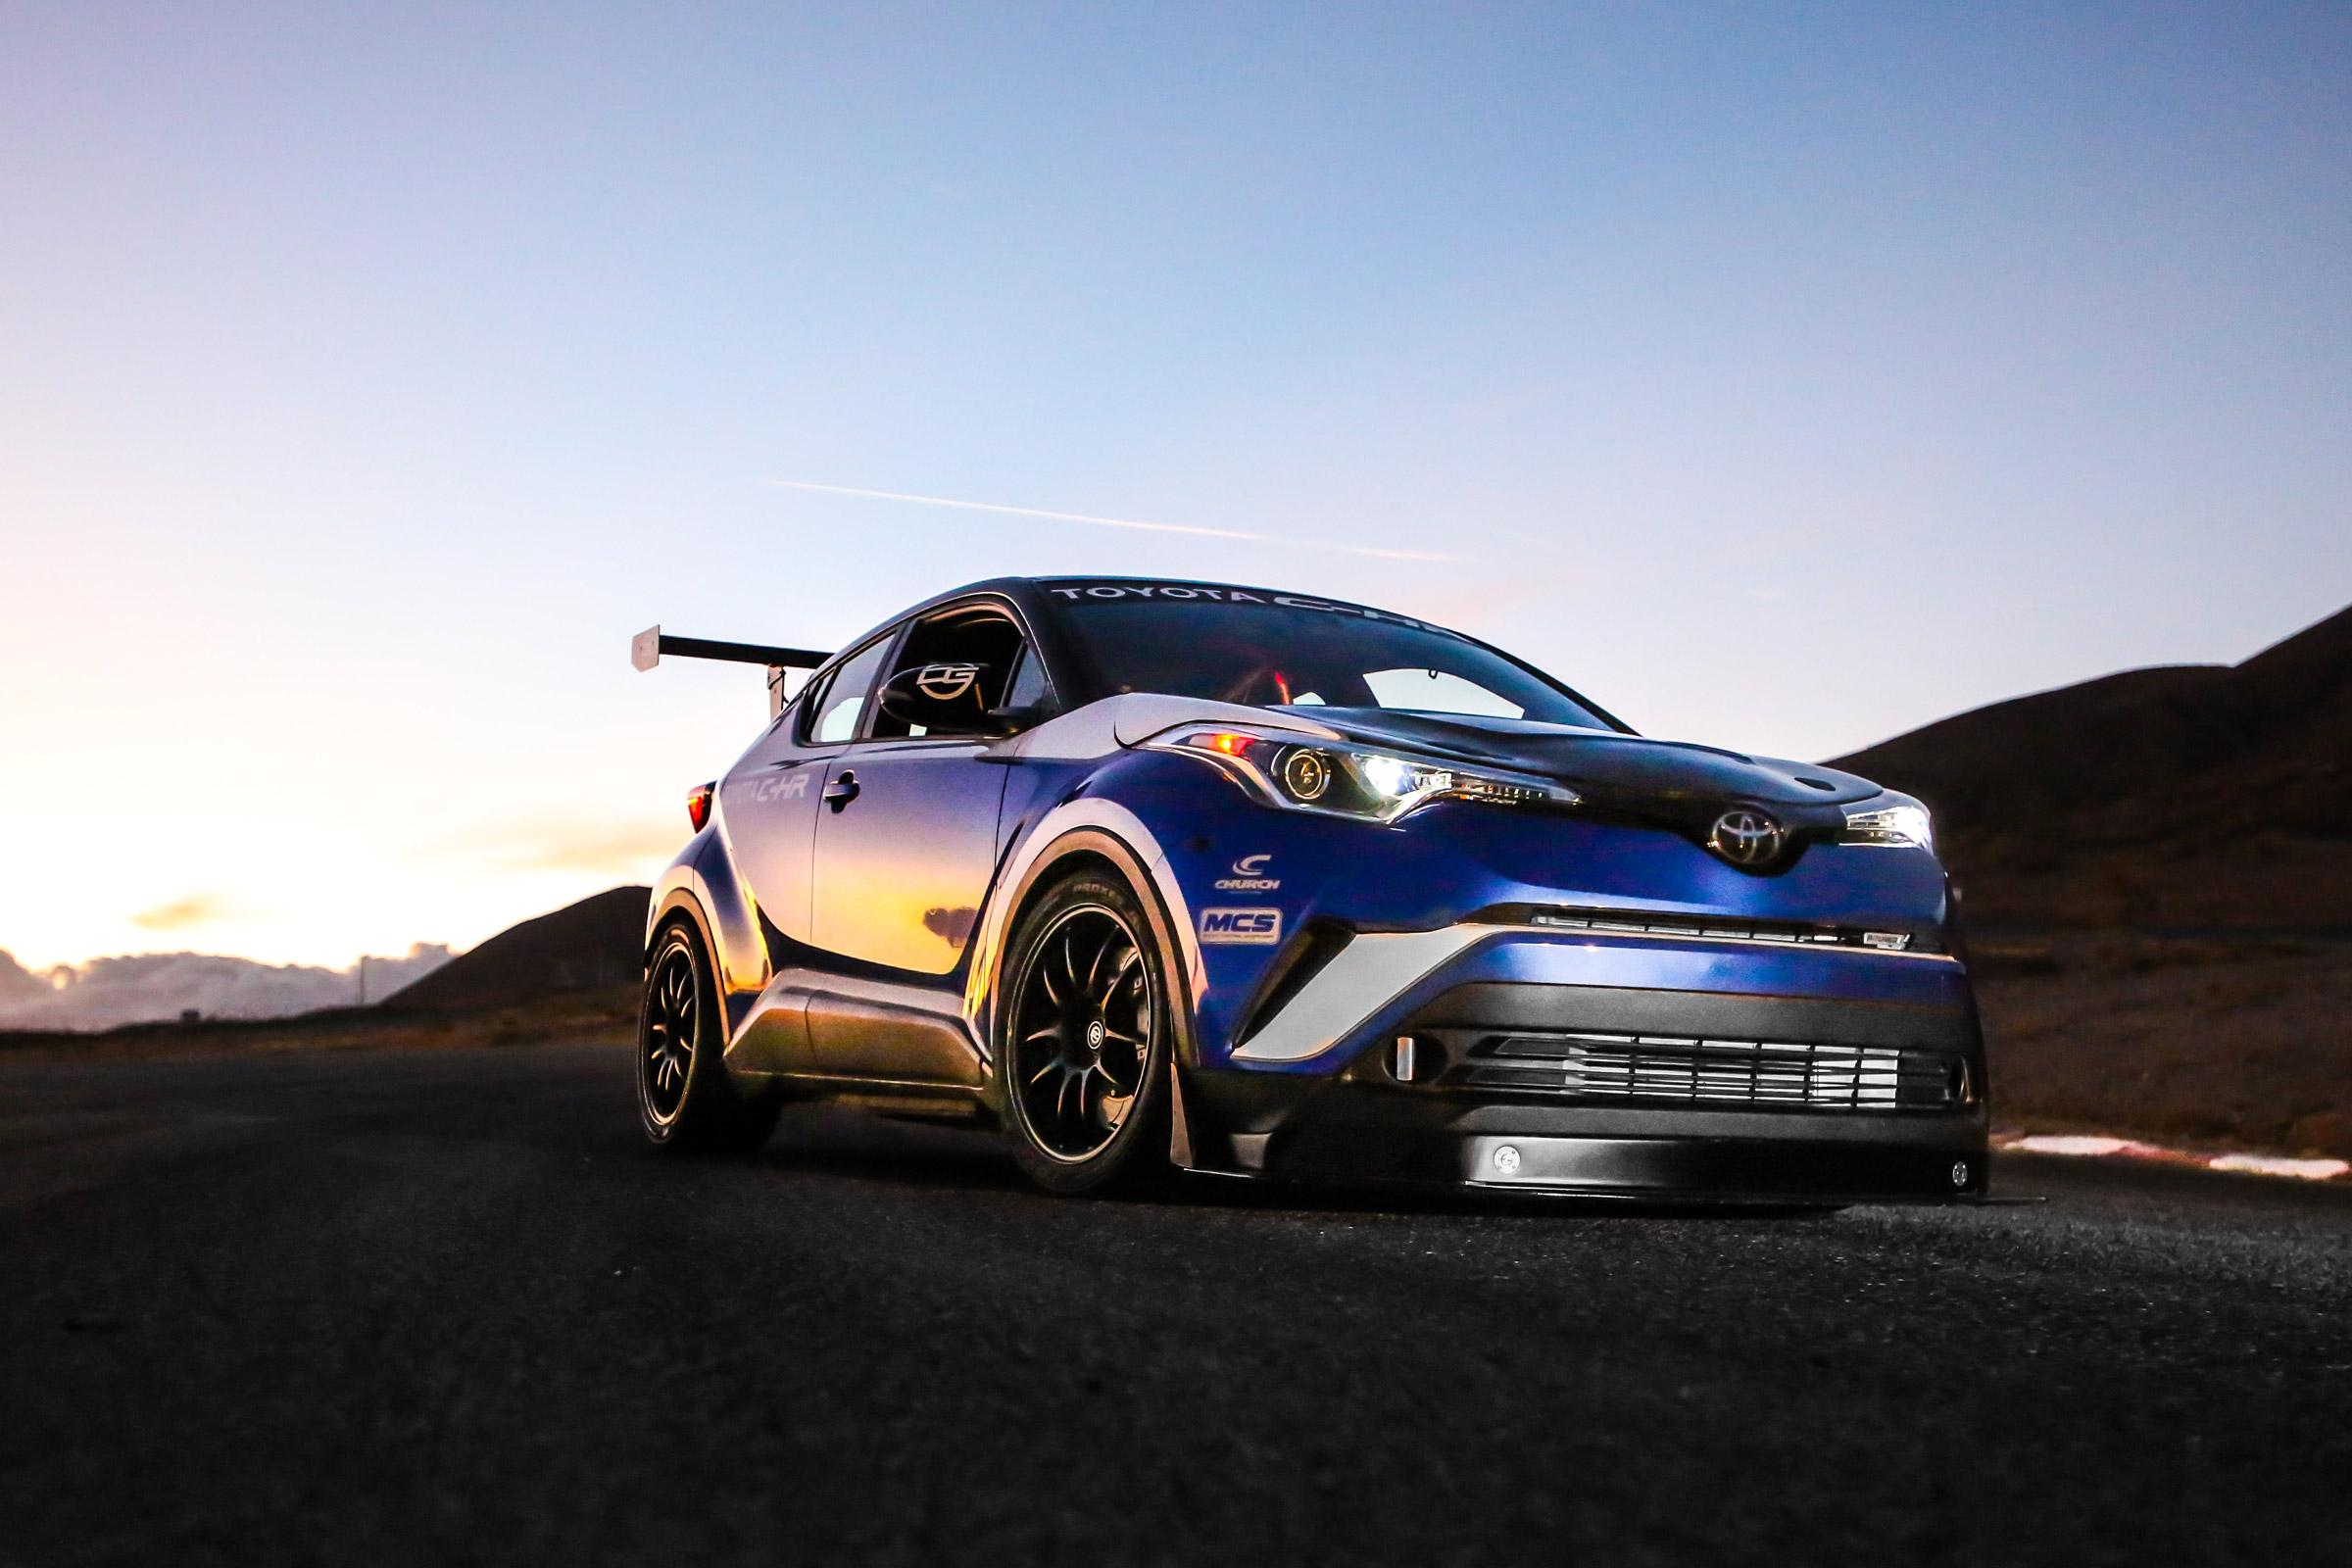 Toyota C-HR R-Tuned revealed at SEMA with 600bhp | Evo